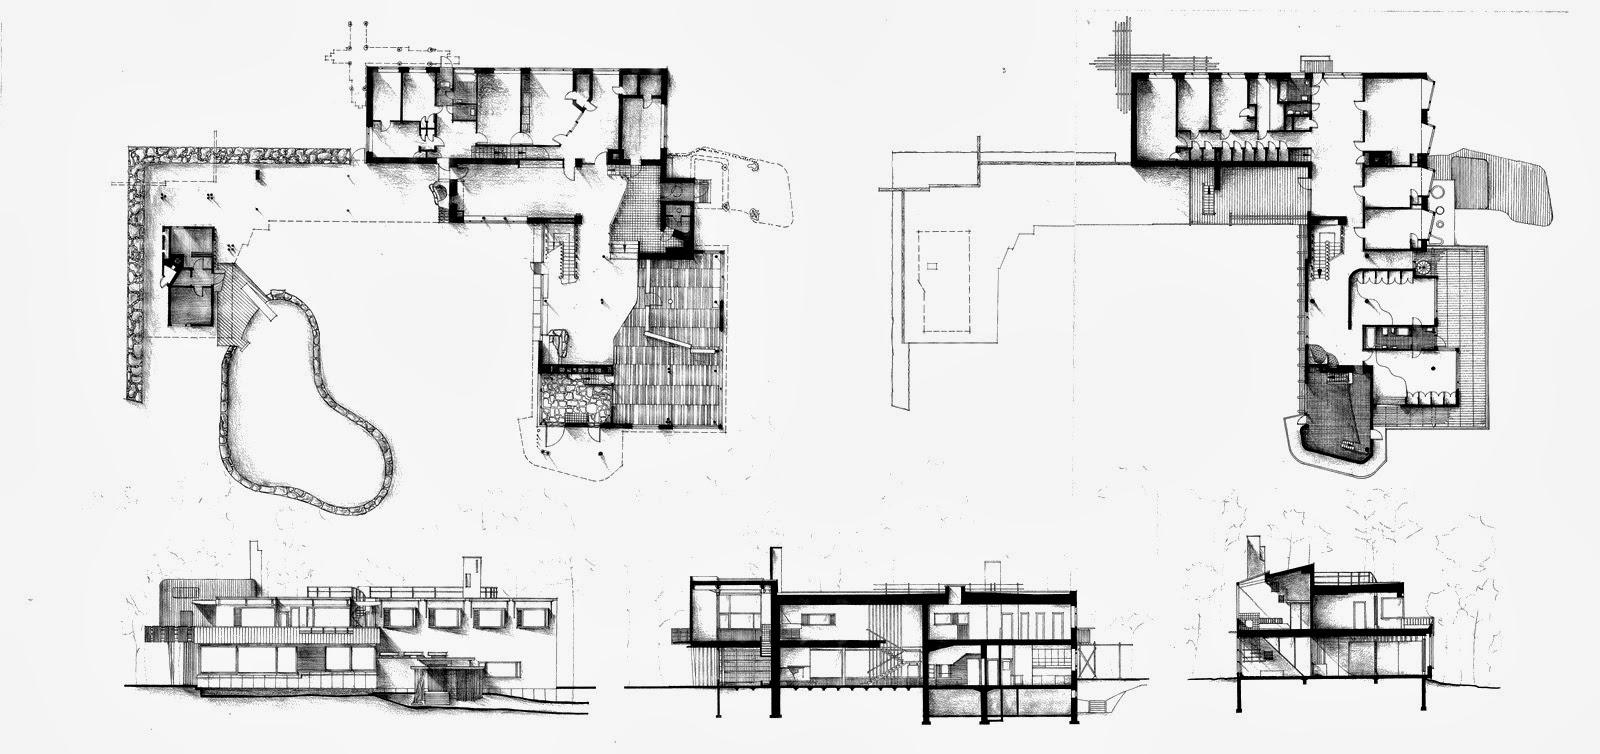 Storia dell 39 architettura moderna alvar aalto - Sala da pranzo dwg ...